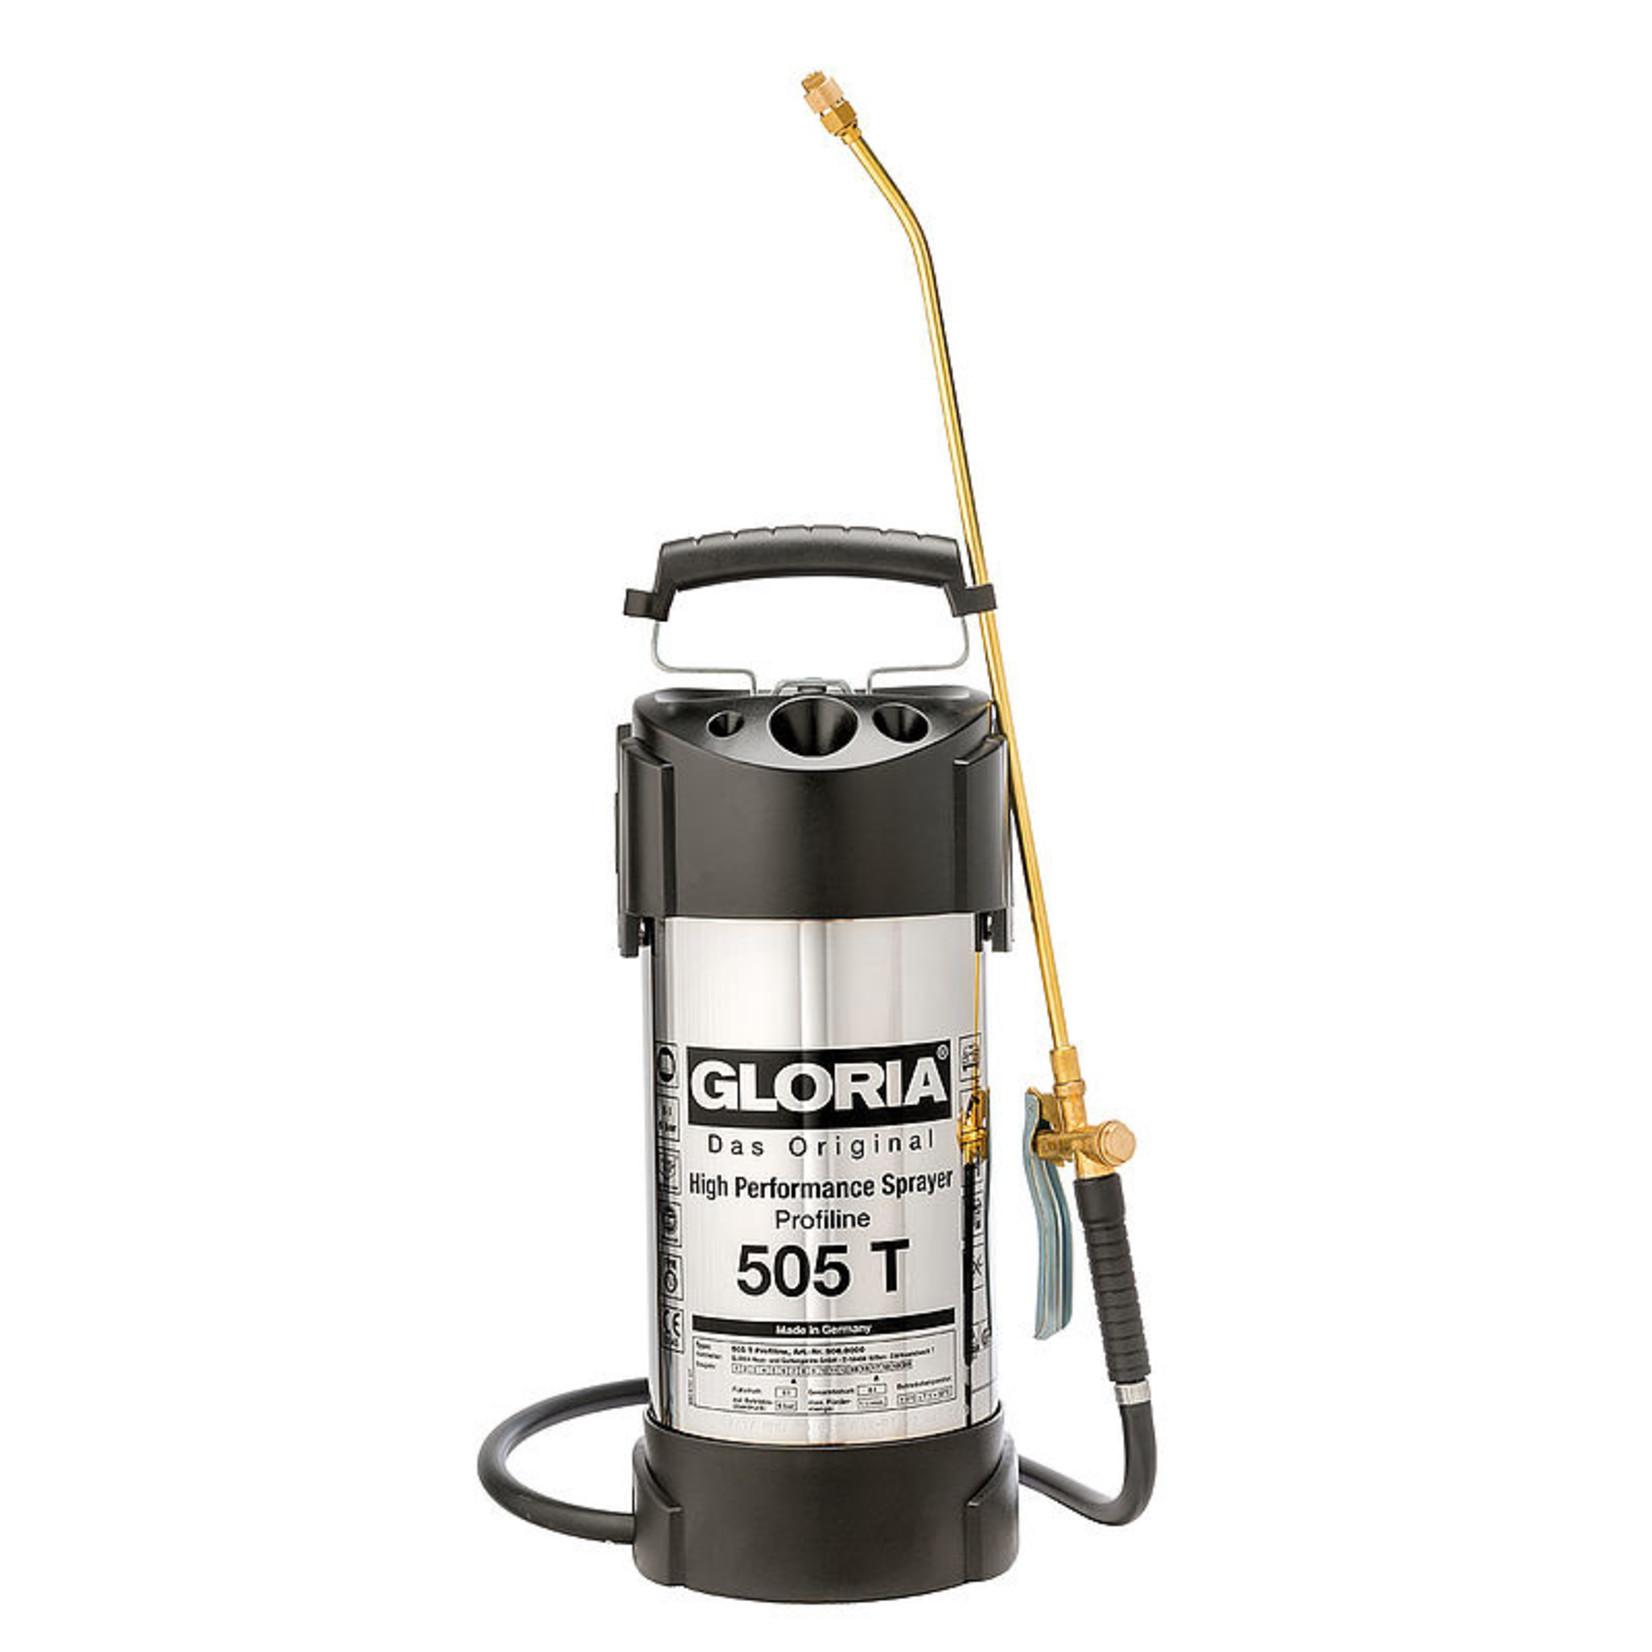 Gloria Industrie Hogedrukspuit RVS 505T Profiline (5 liter)